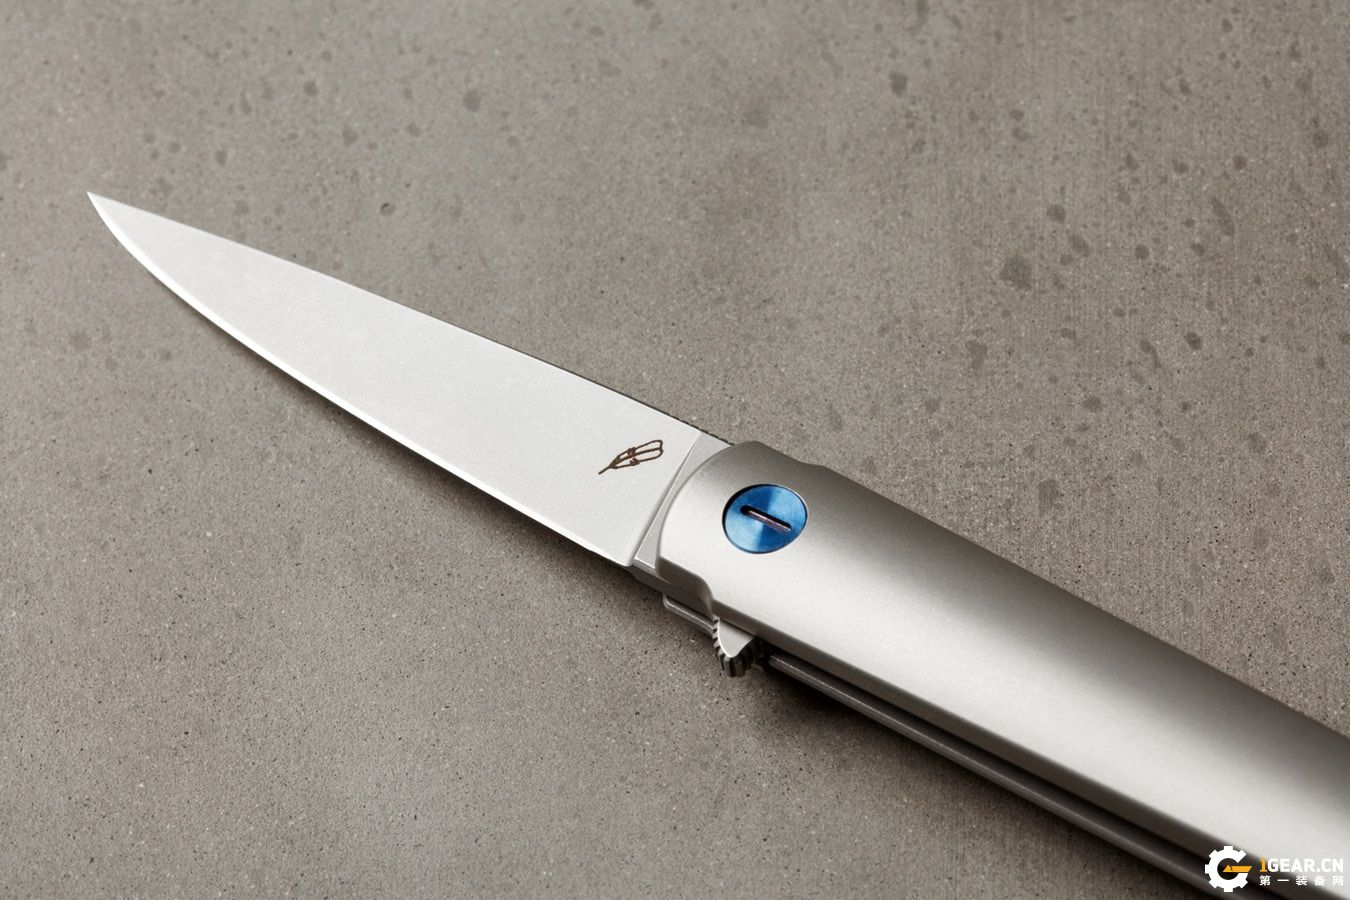 Shinola X Zieba联合推出MS3 Manhattan折刀,不仅耐操还超美